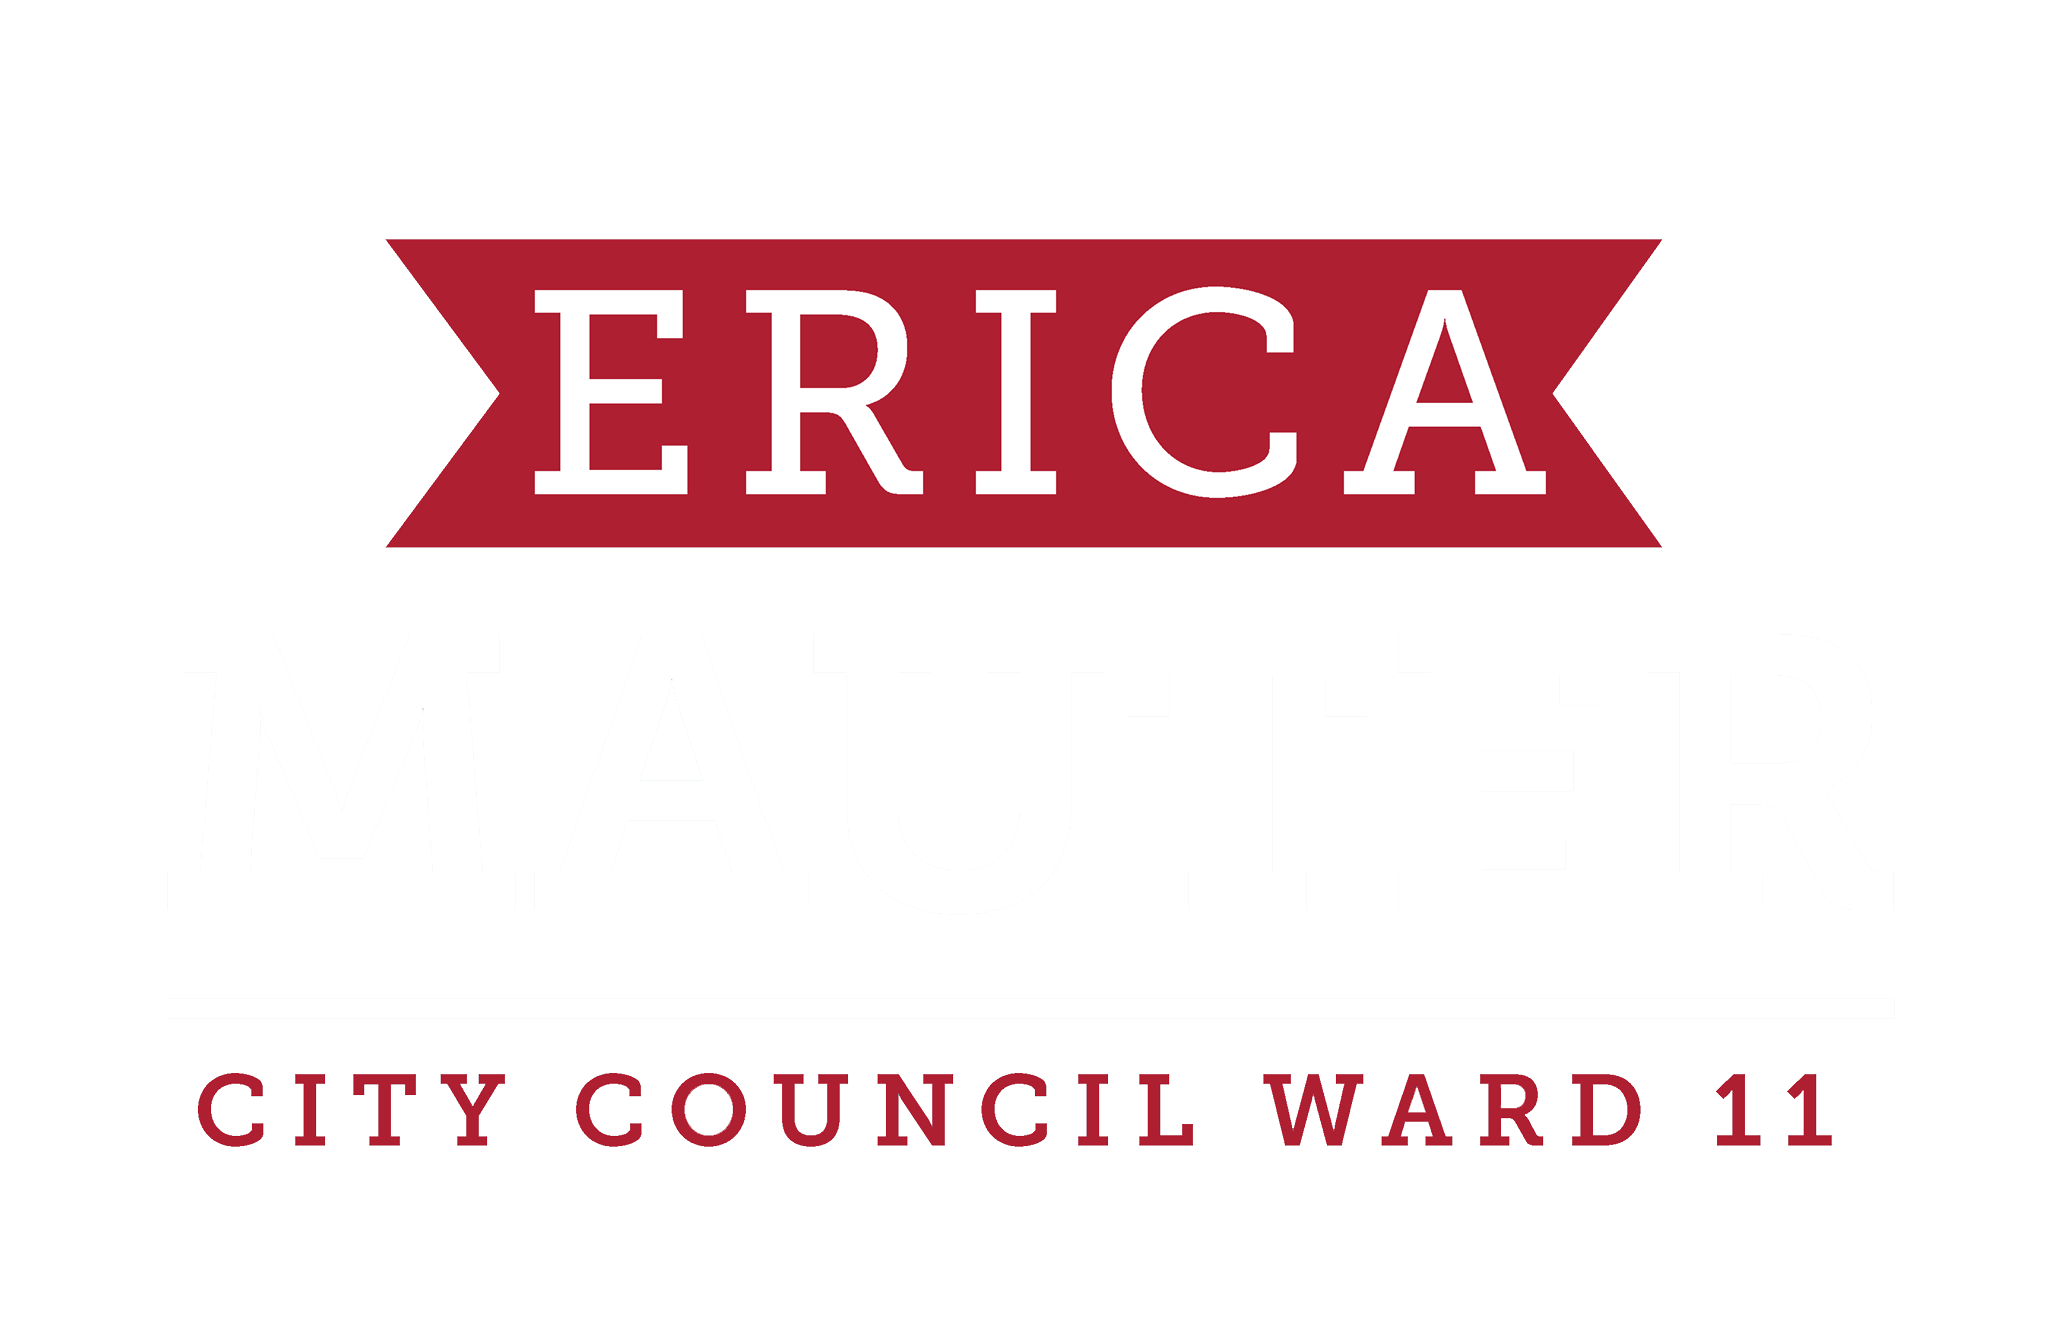 Erica Mauter